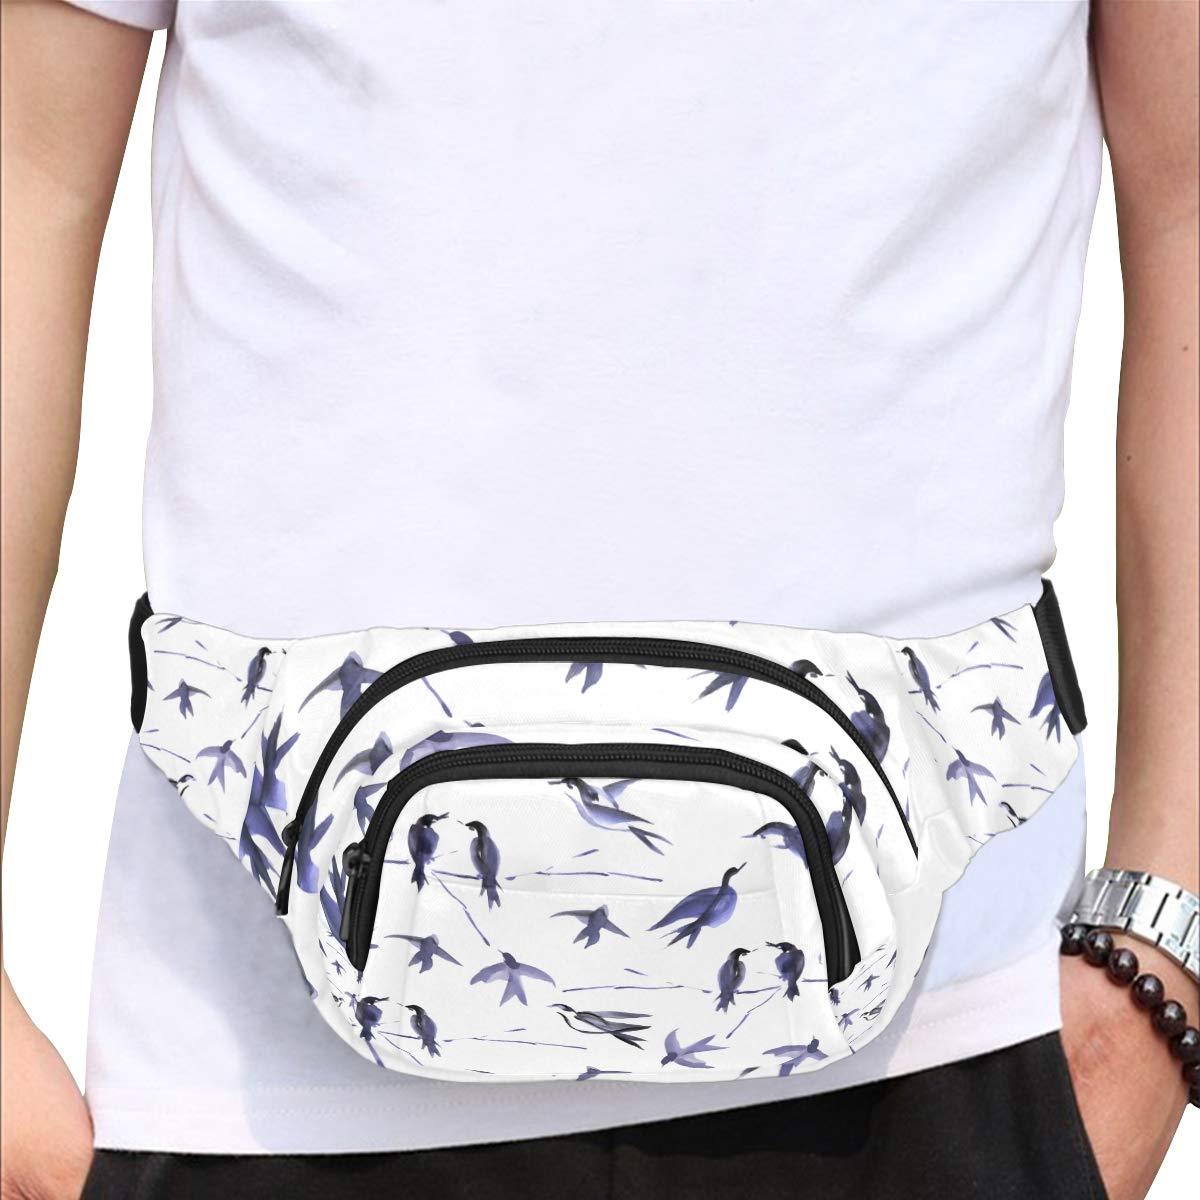 Many Swallows In Flight Fenny Packs Waist Bags Adjustable Belt Waterproof Nylon Travel Running Sport Vacation Party For Men Women Boys Girls Kids